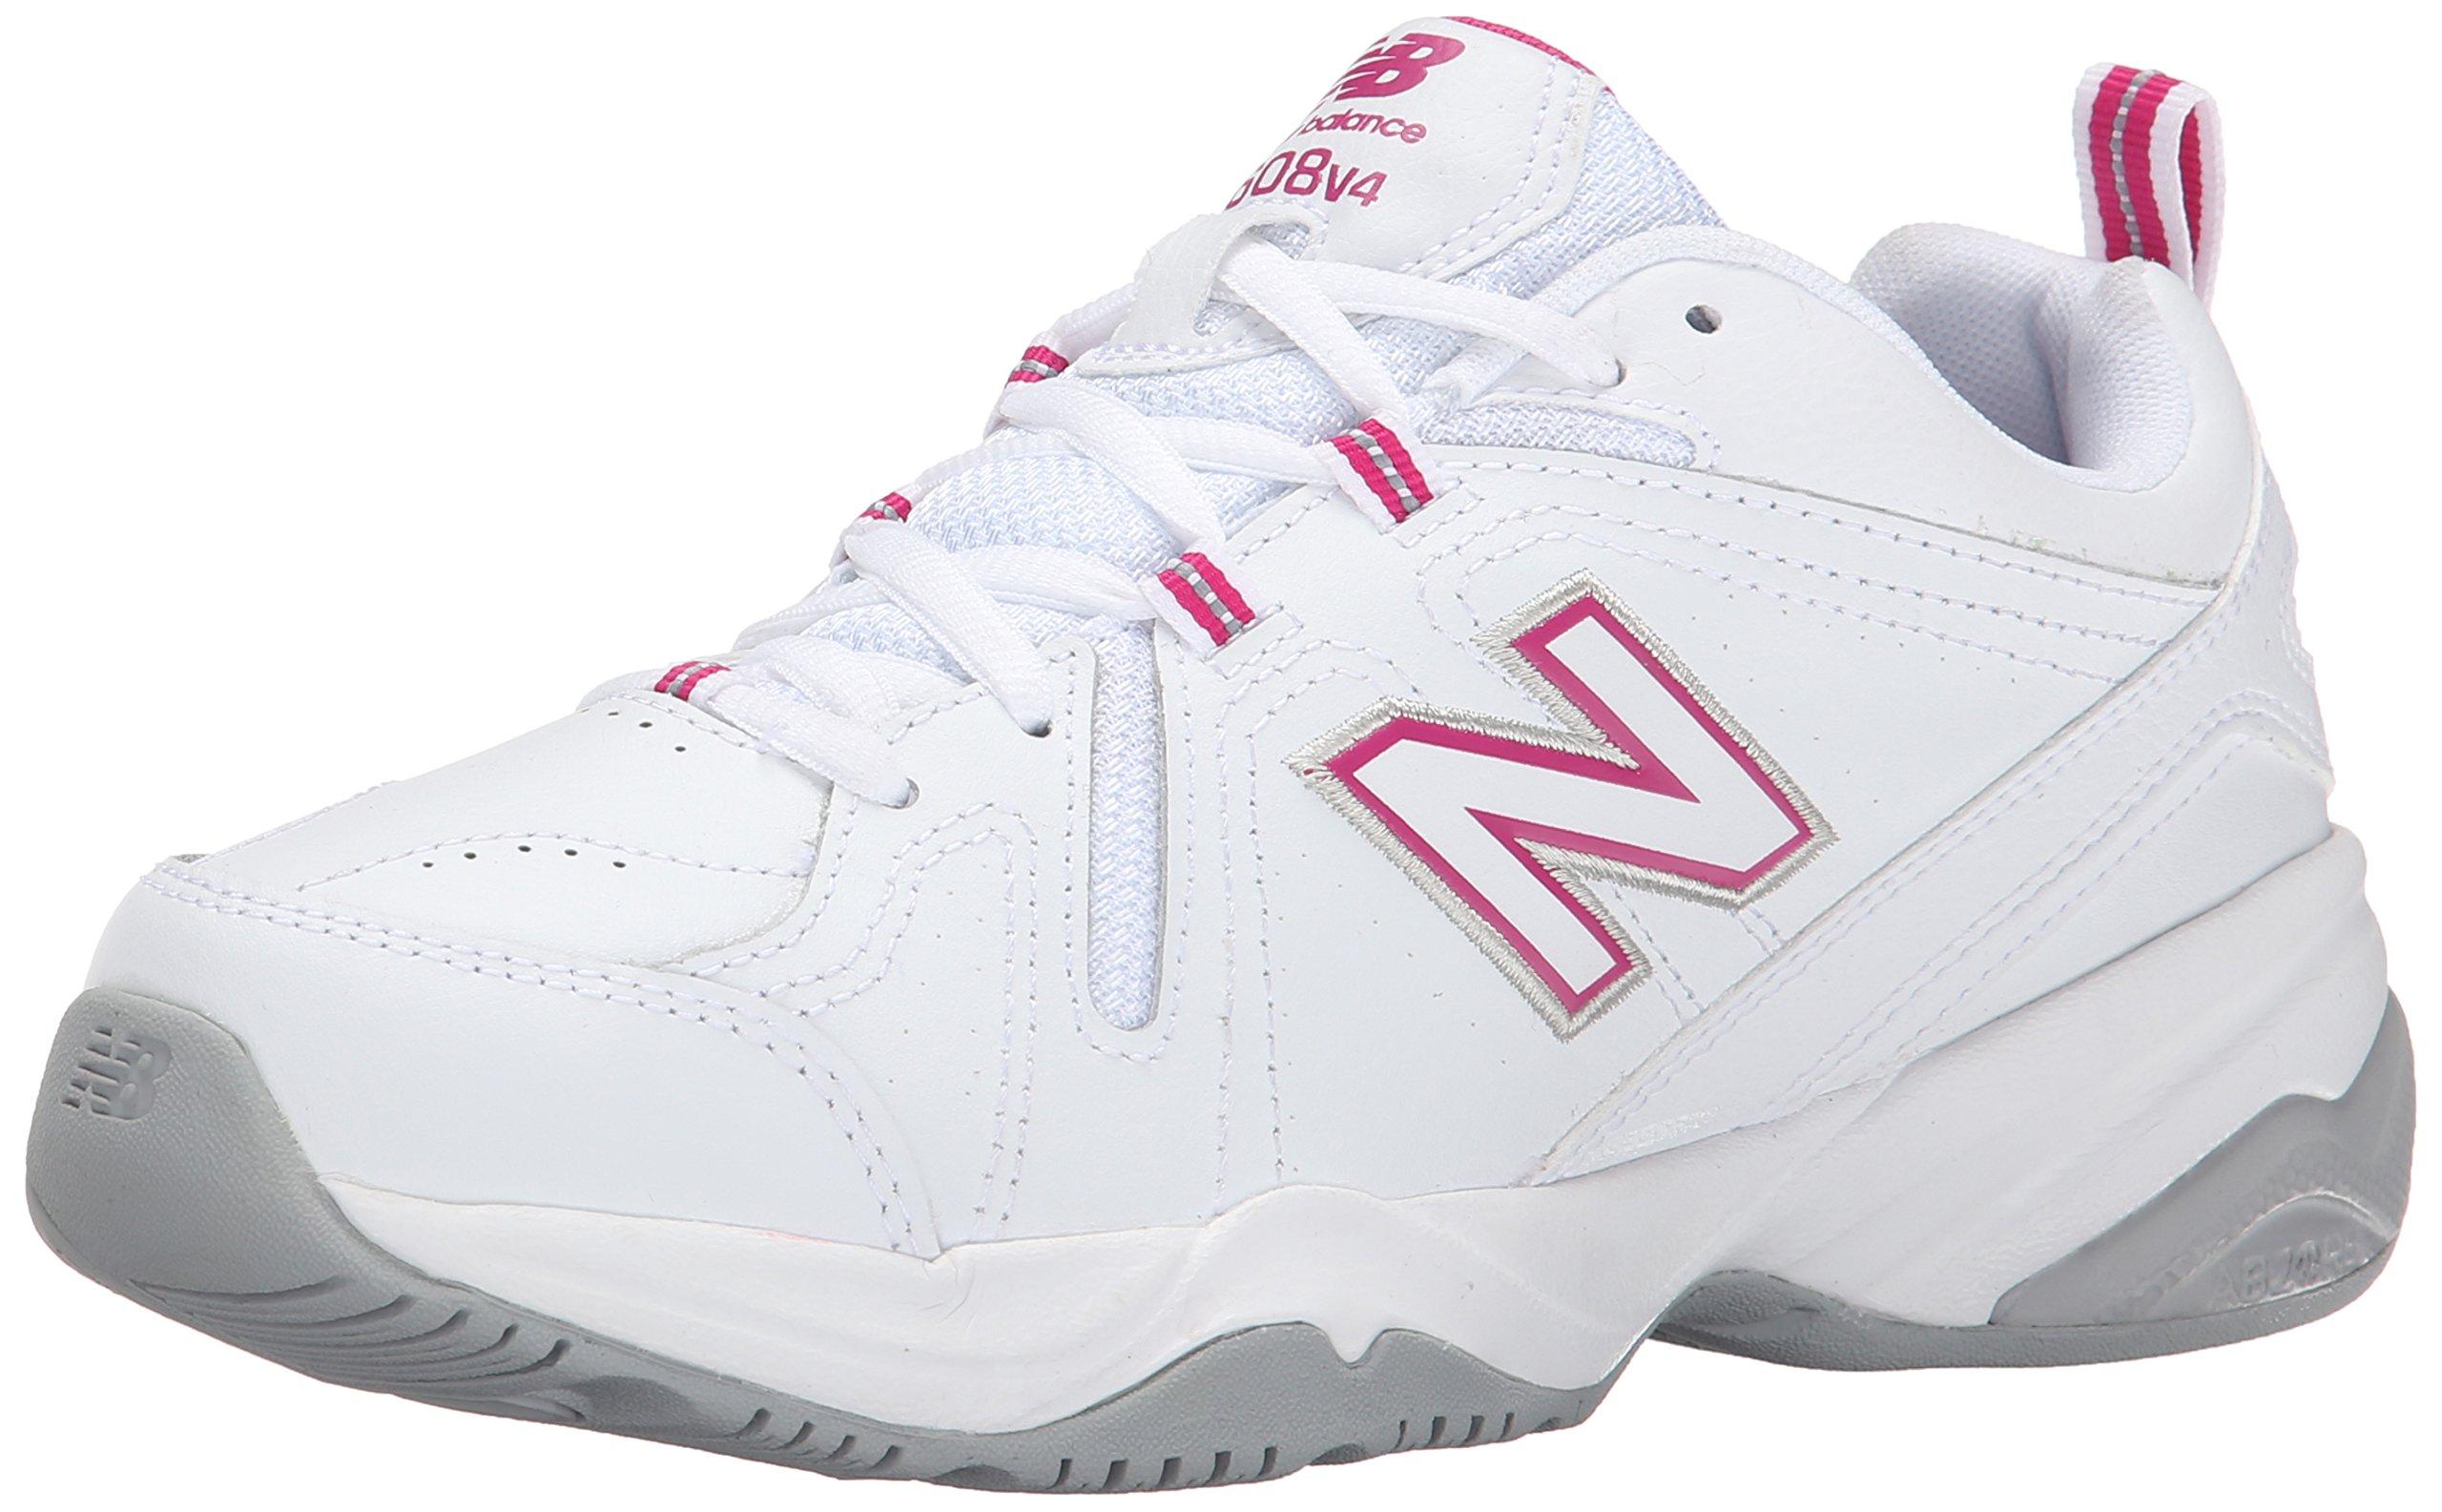 New Balance Women's WX608v4 Training Shoe, White/Pink, 8 B US